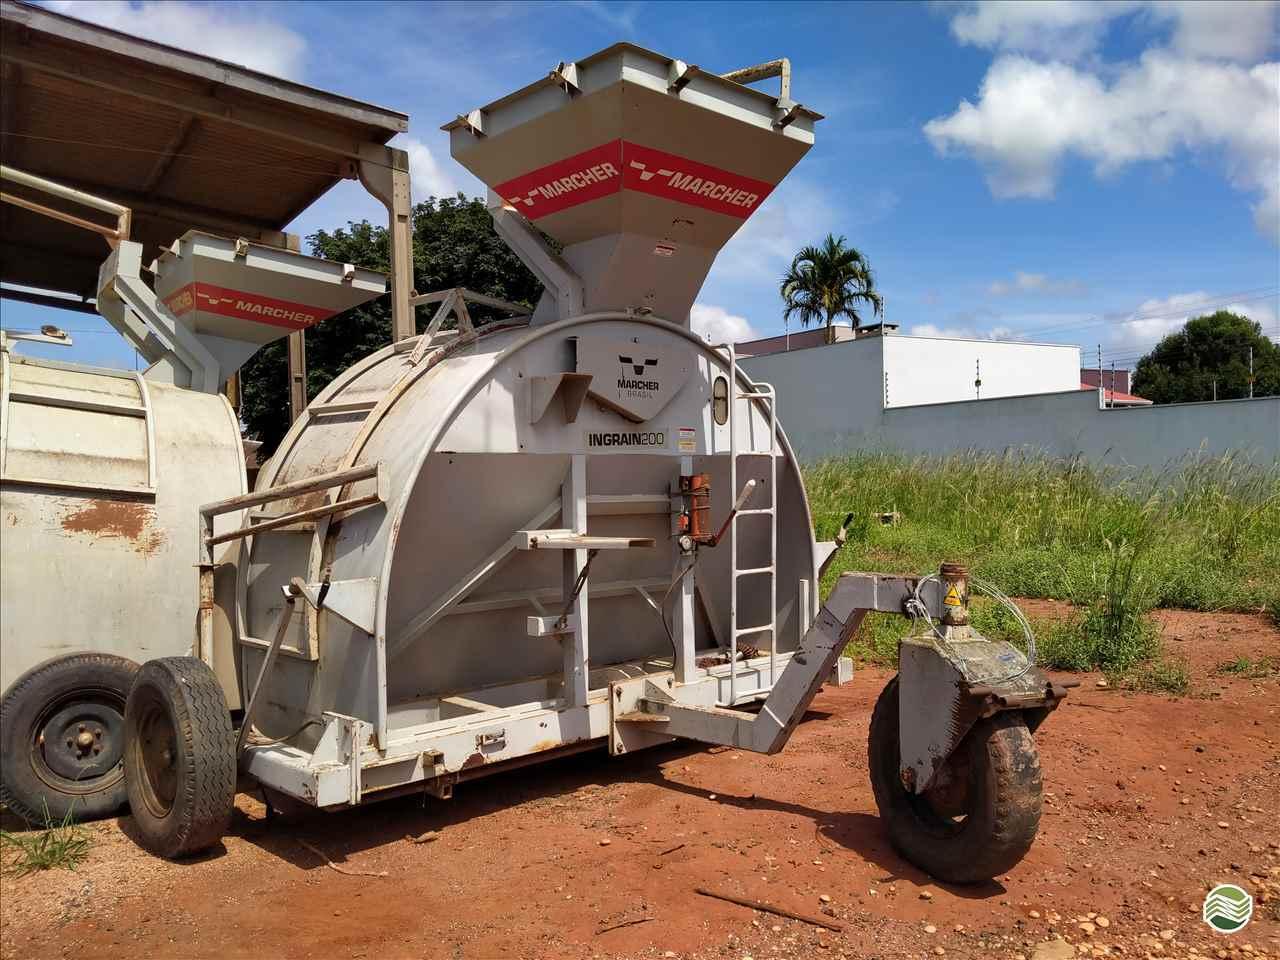 IMPLEMENTOS AGRICOLAS EMBUTIDORA EMBUTIDORA DE GRÃOS Gomagril Máquinas Agrícolas TANGARA DA SERRA MATO GROSSO MT